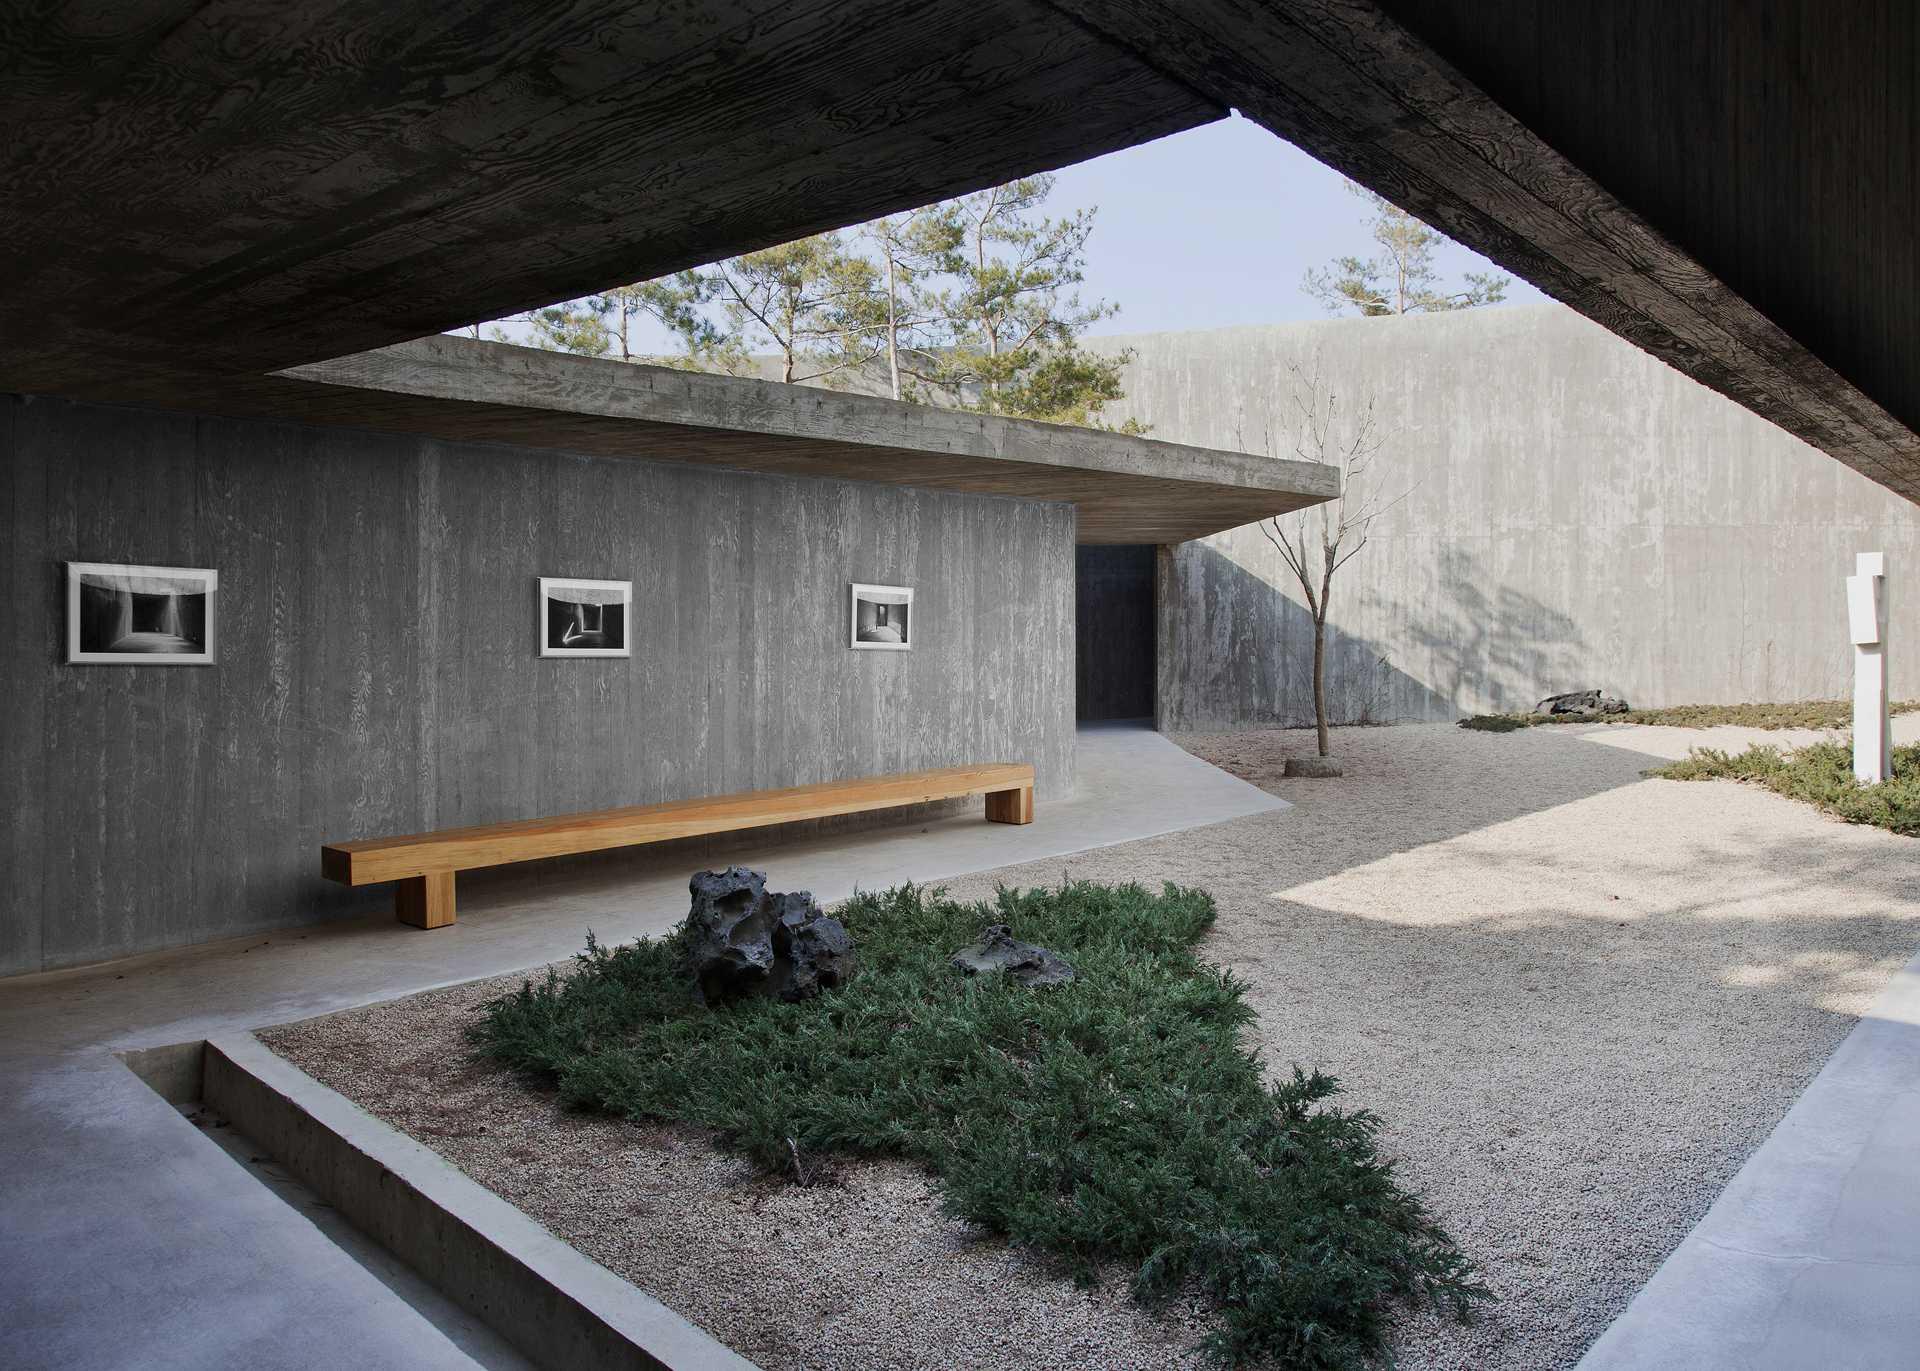 Art Pavilion in Saya Park  - 10 JongOh Kim 51